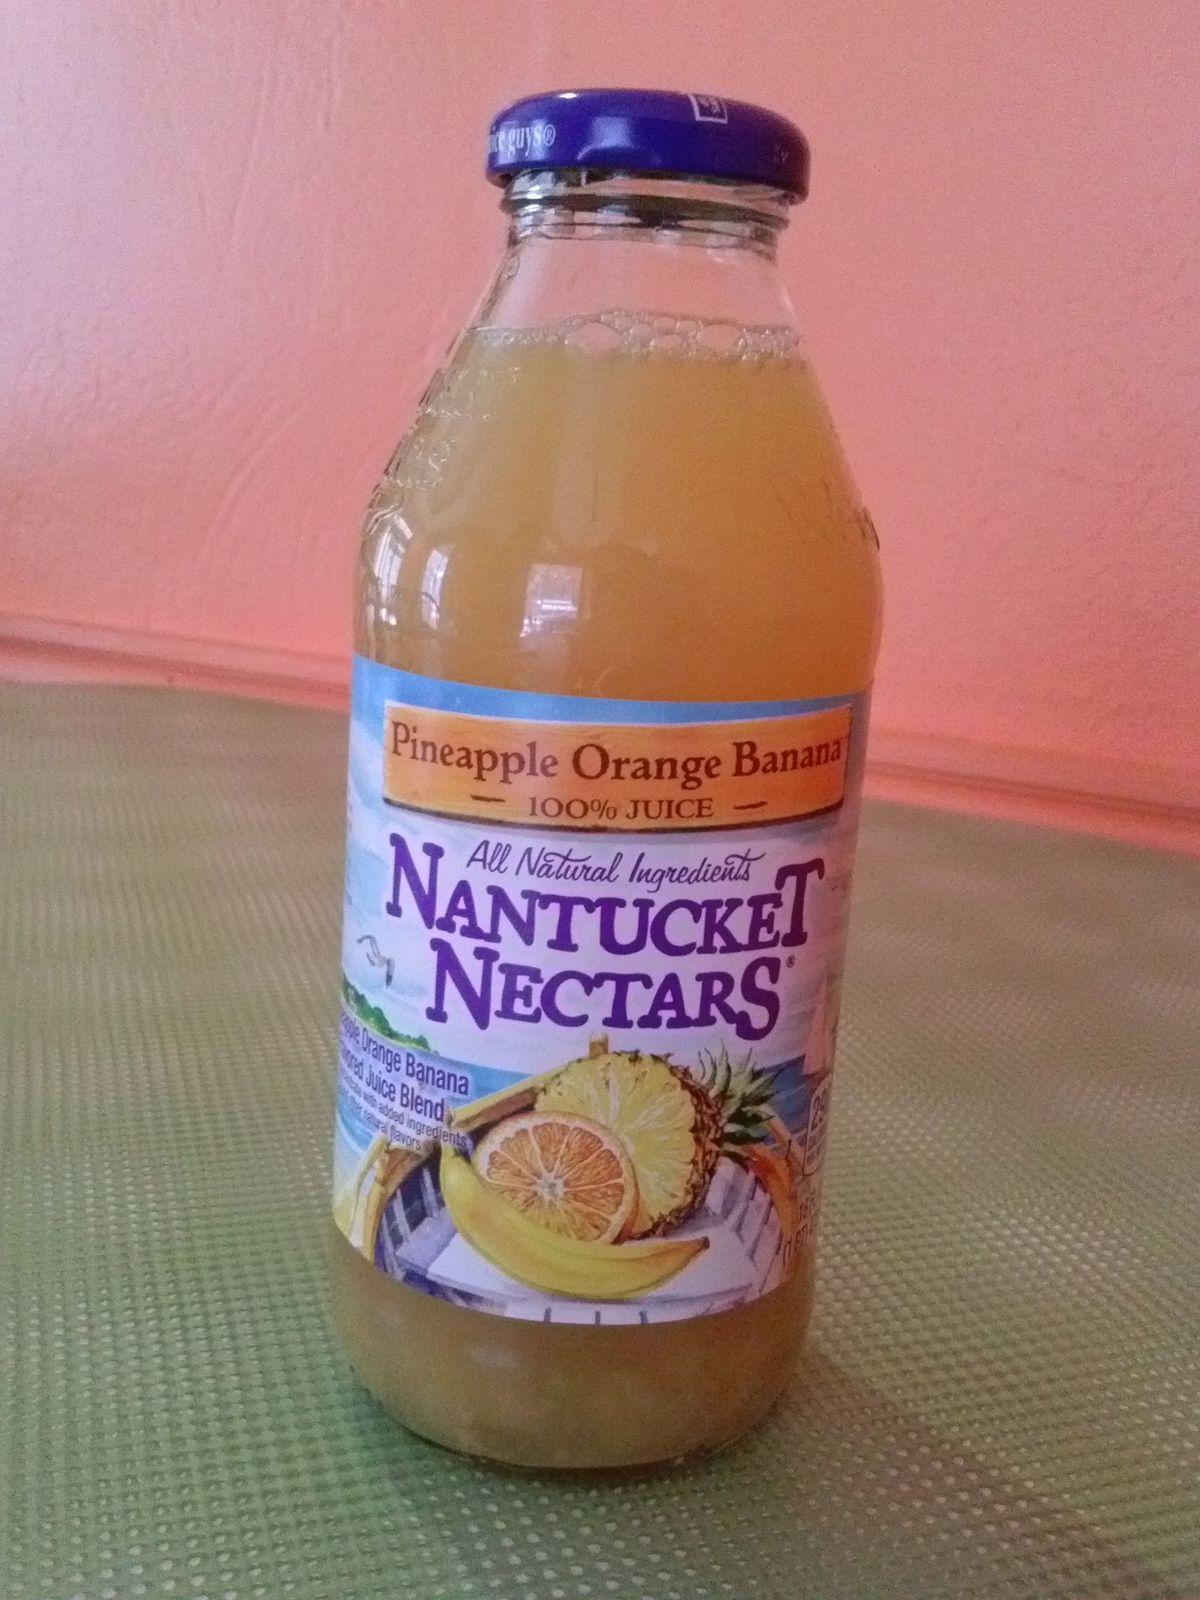 Nantucket Nectars Wikipedia